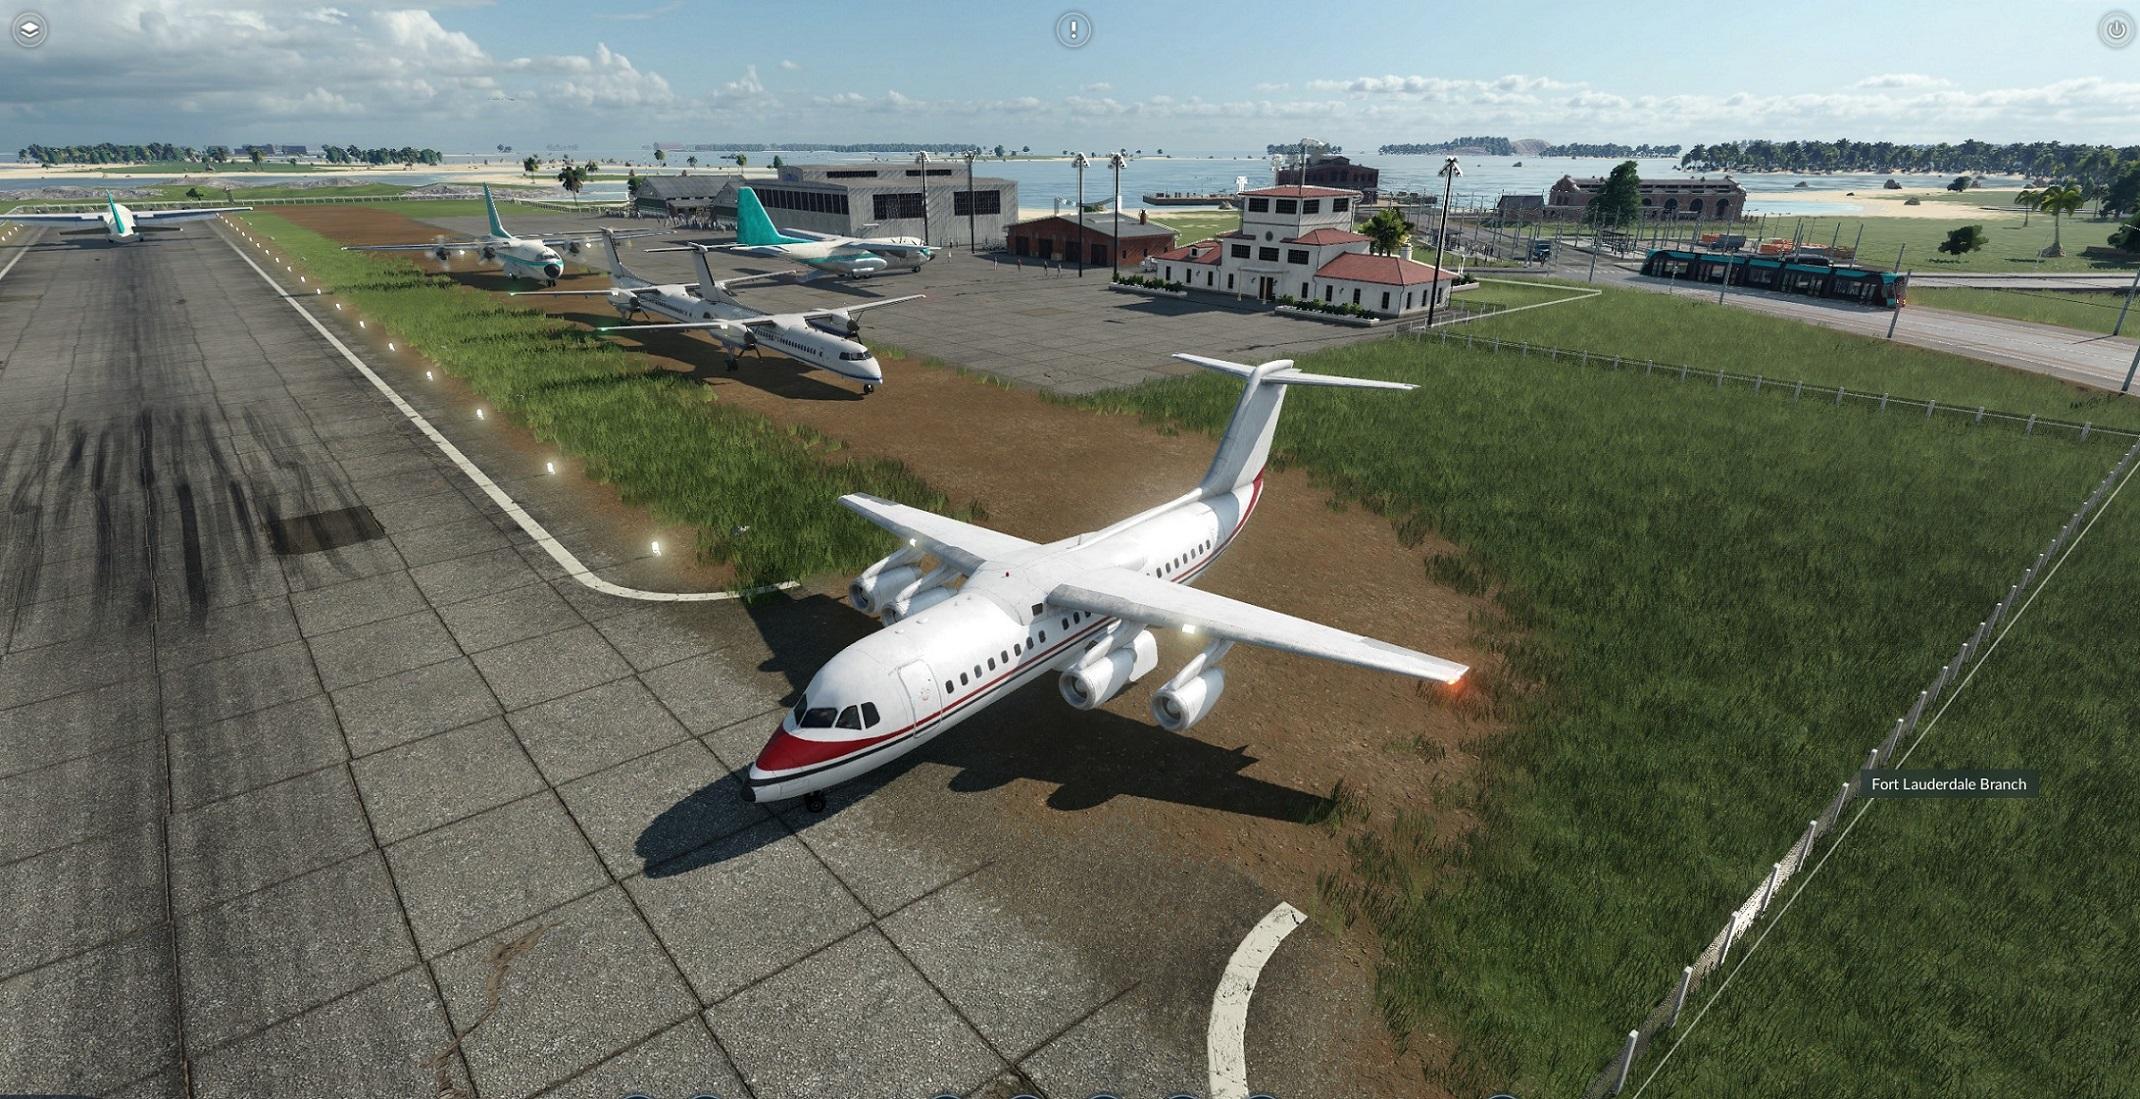 Transport Fever 2 - Bae-146 Short Field Use